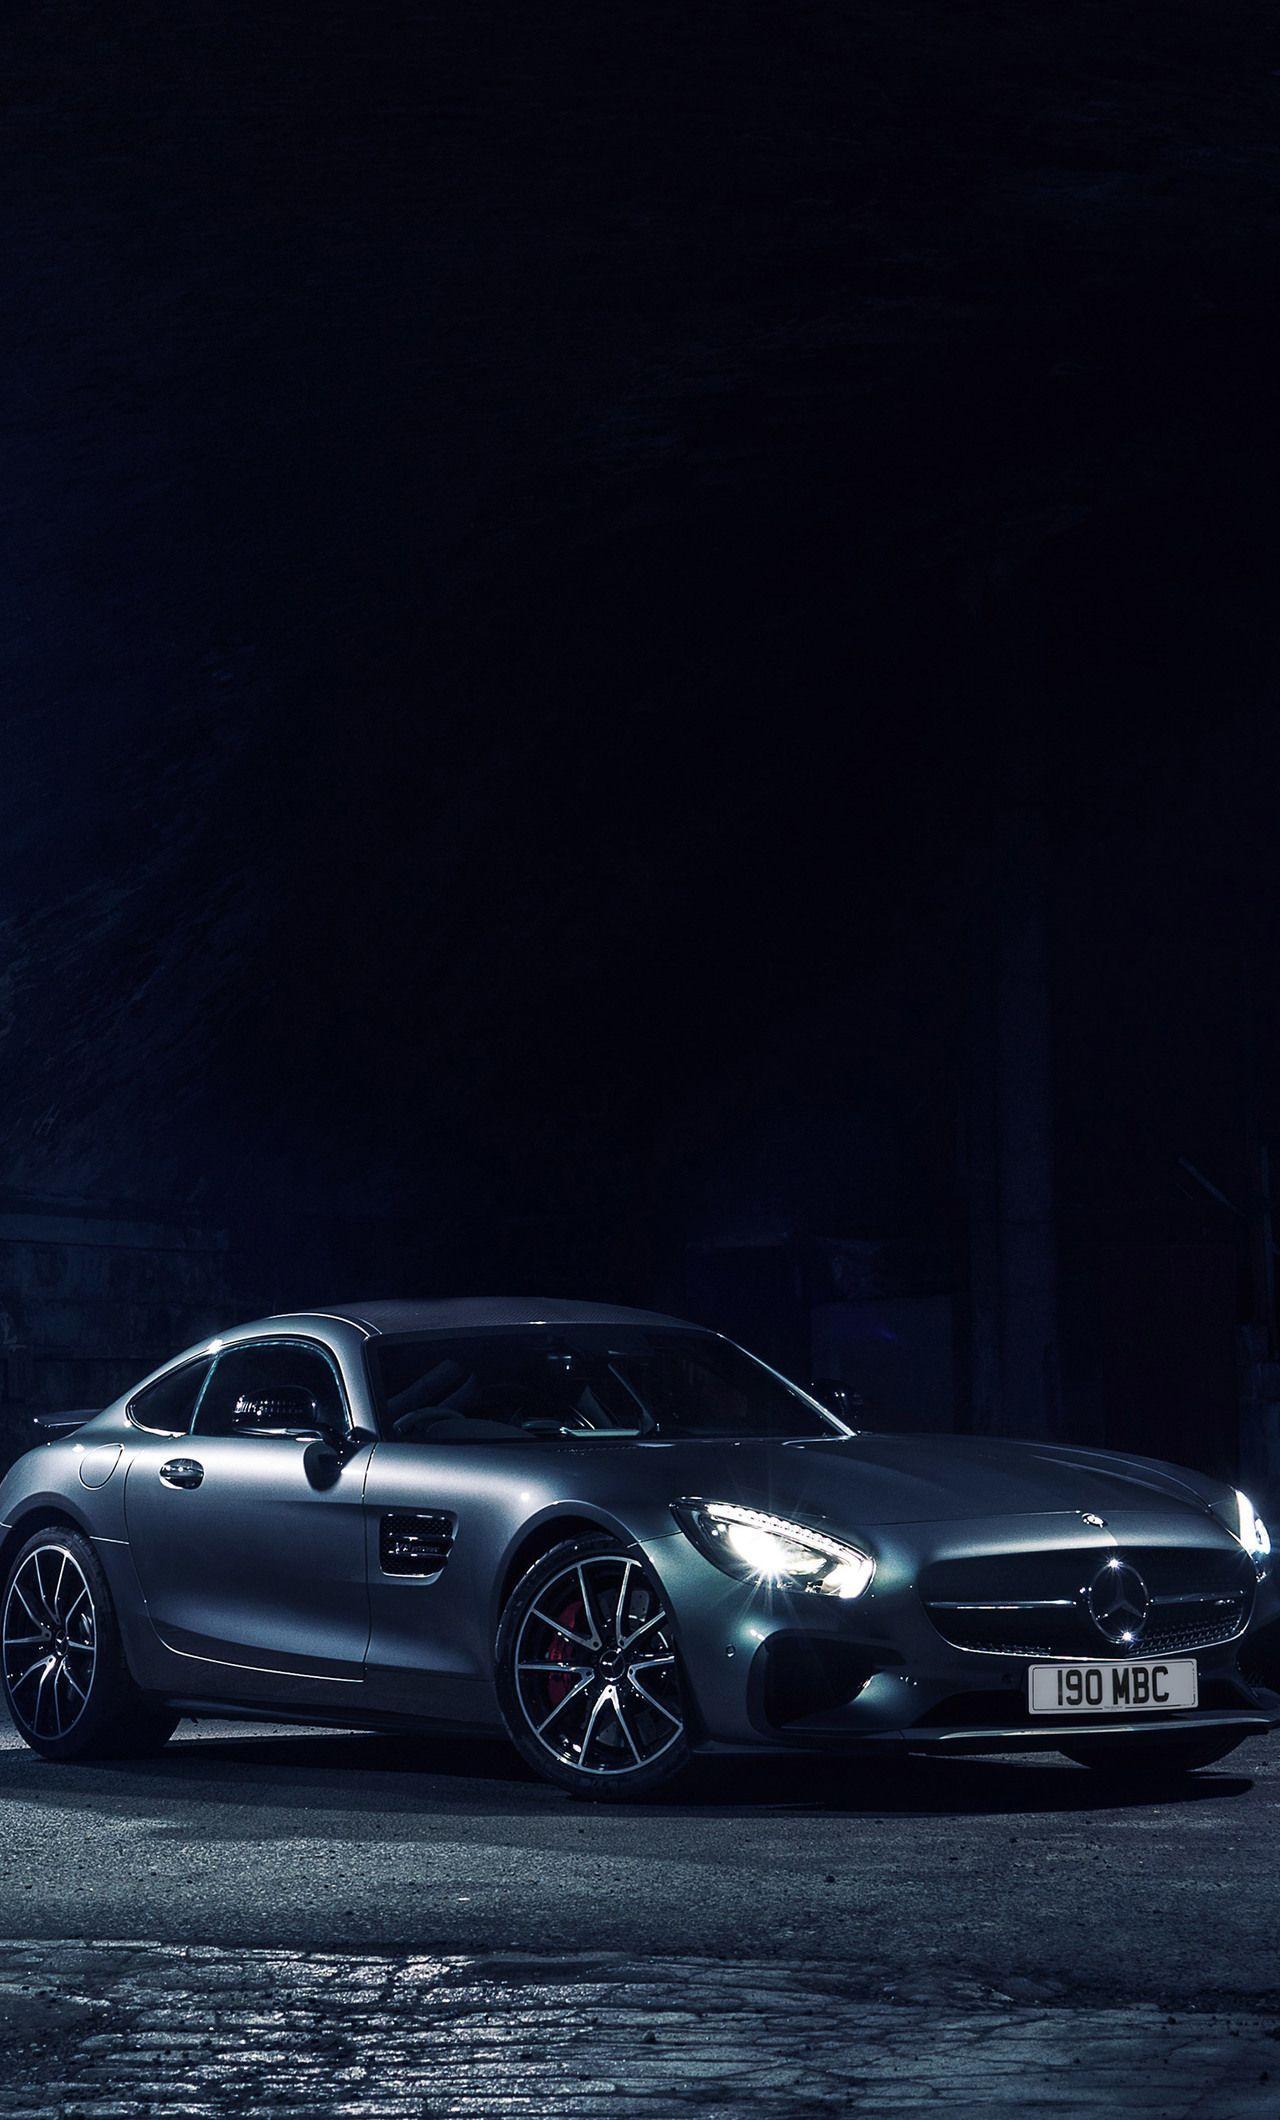 1280x2120 1280x2120 2018 Mercedes Benz Amg Gt Iphone 6 Hd 4k Wallpapers Mercedes Benz Amg Mercedes Benz Mercedes